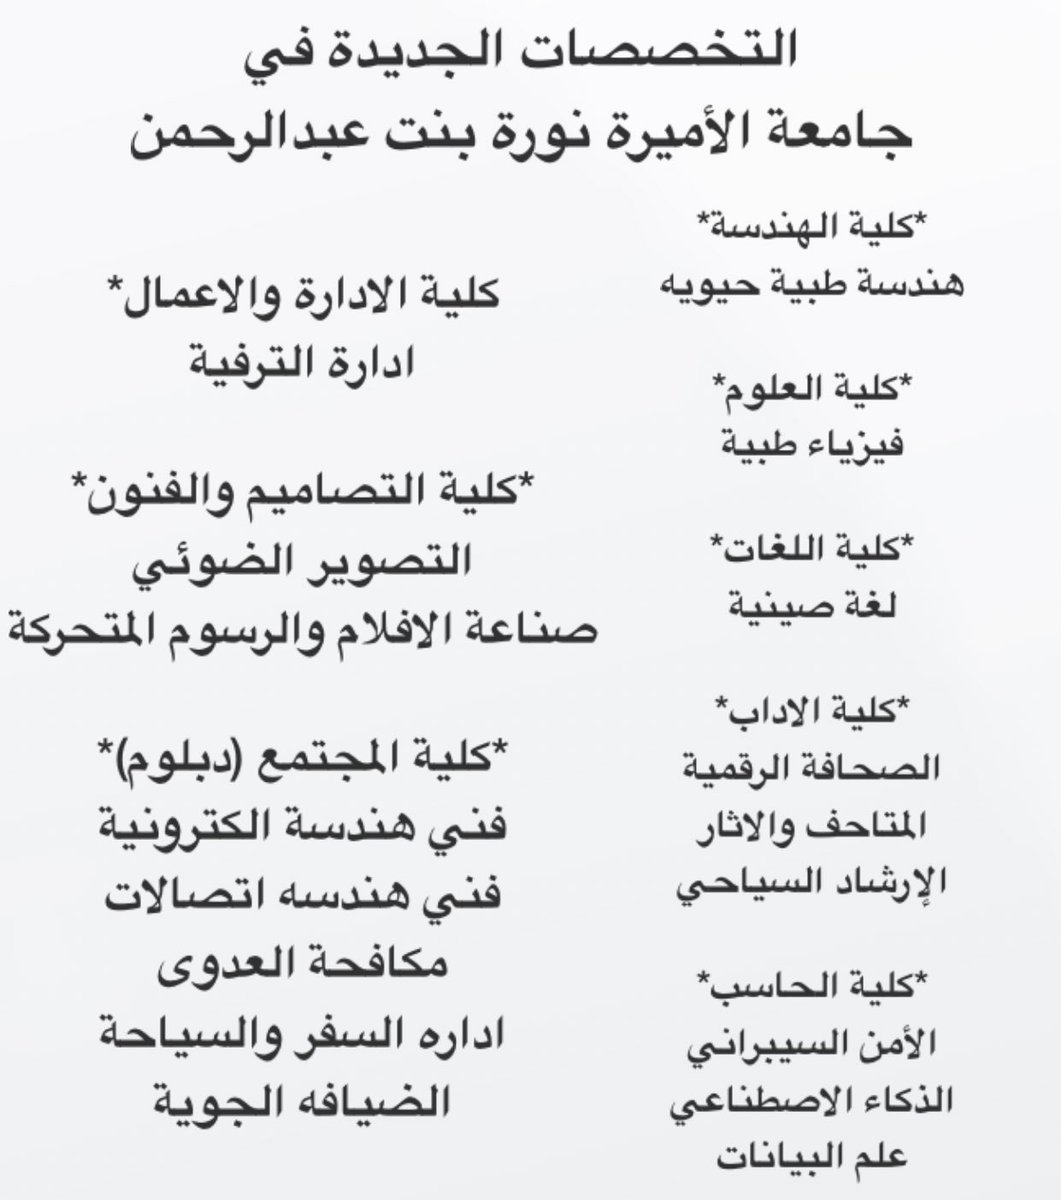 D7d7 Altamimi On Twitter التخصصات الجديده في جامعة نوره